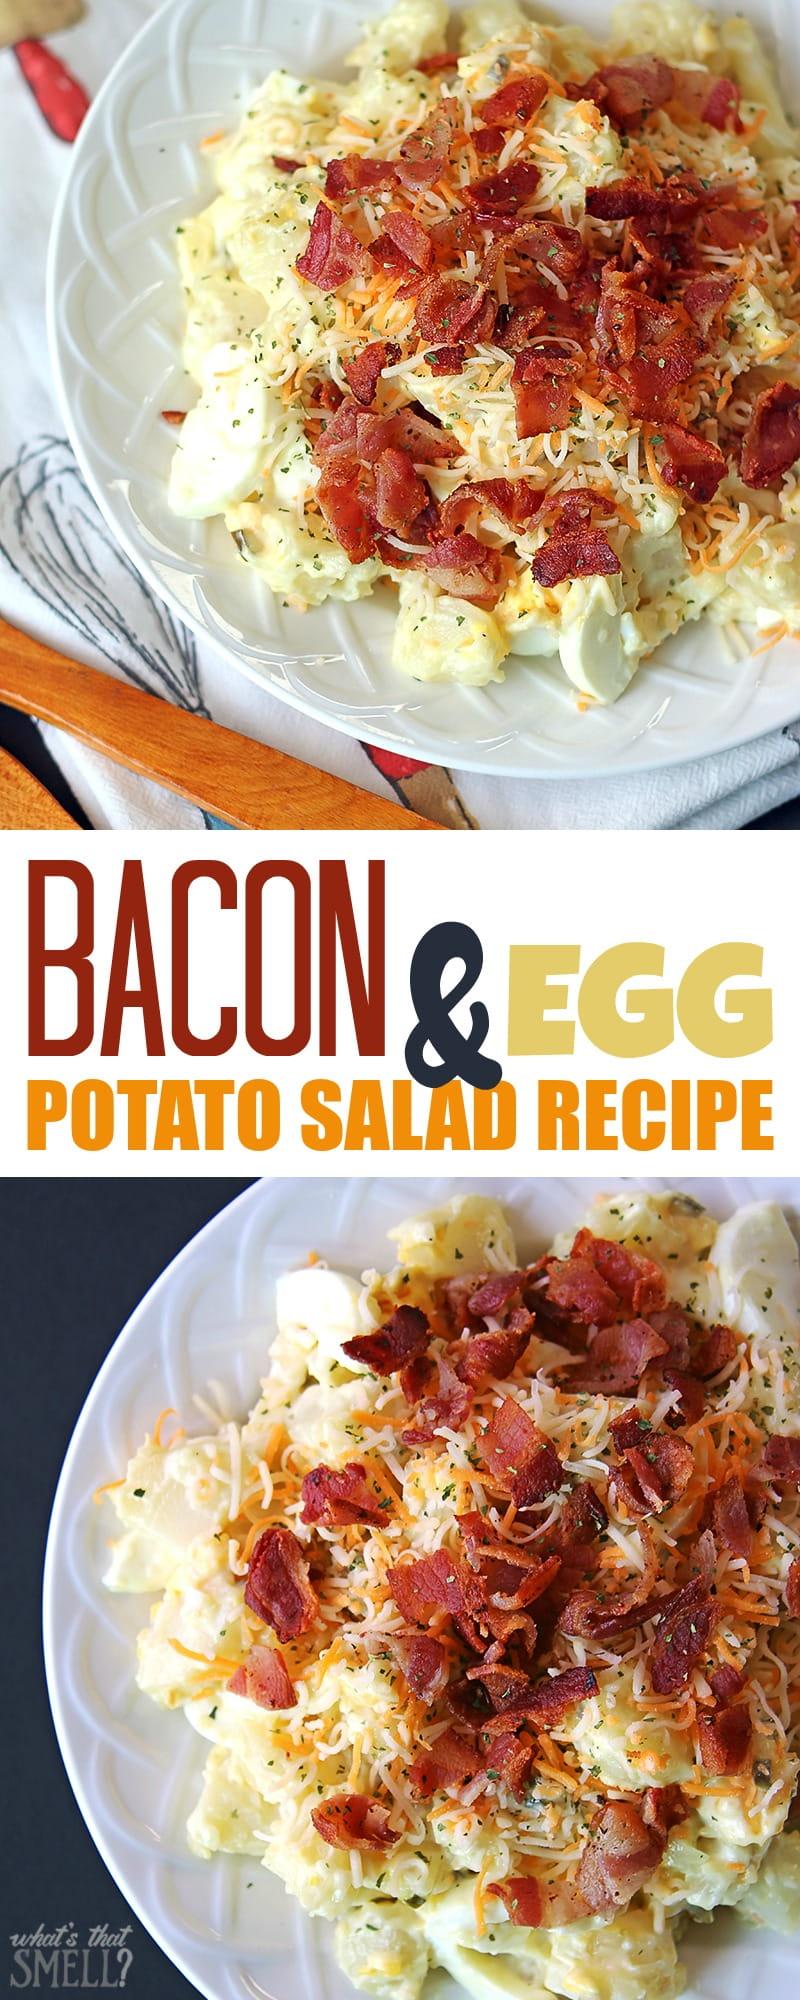 Bacon and egg potato salad recipe - this yummy potato salad includes bacon and eggs and no celery!